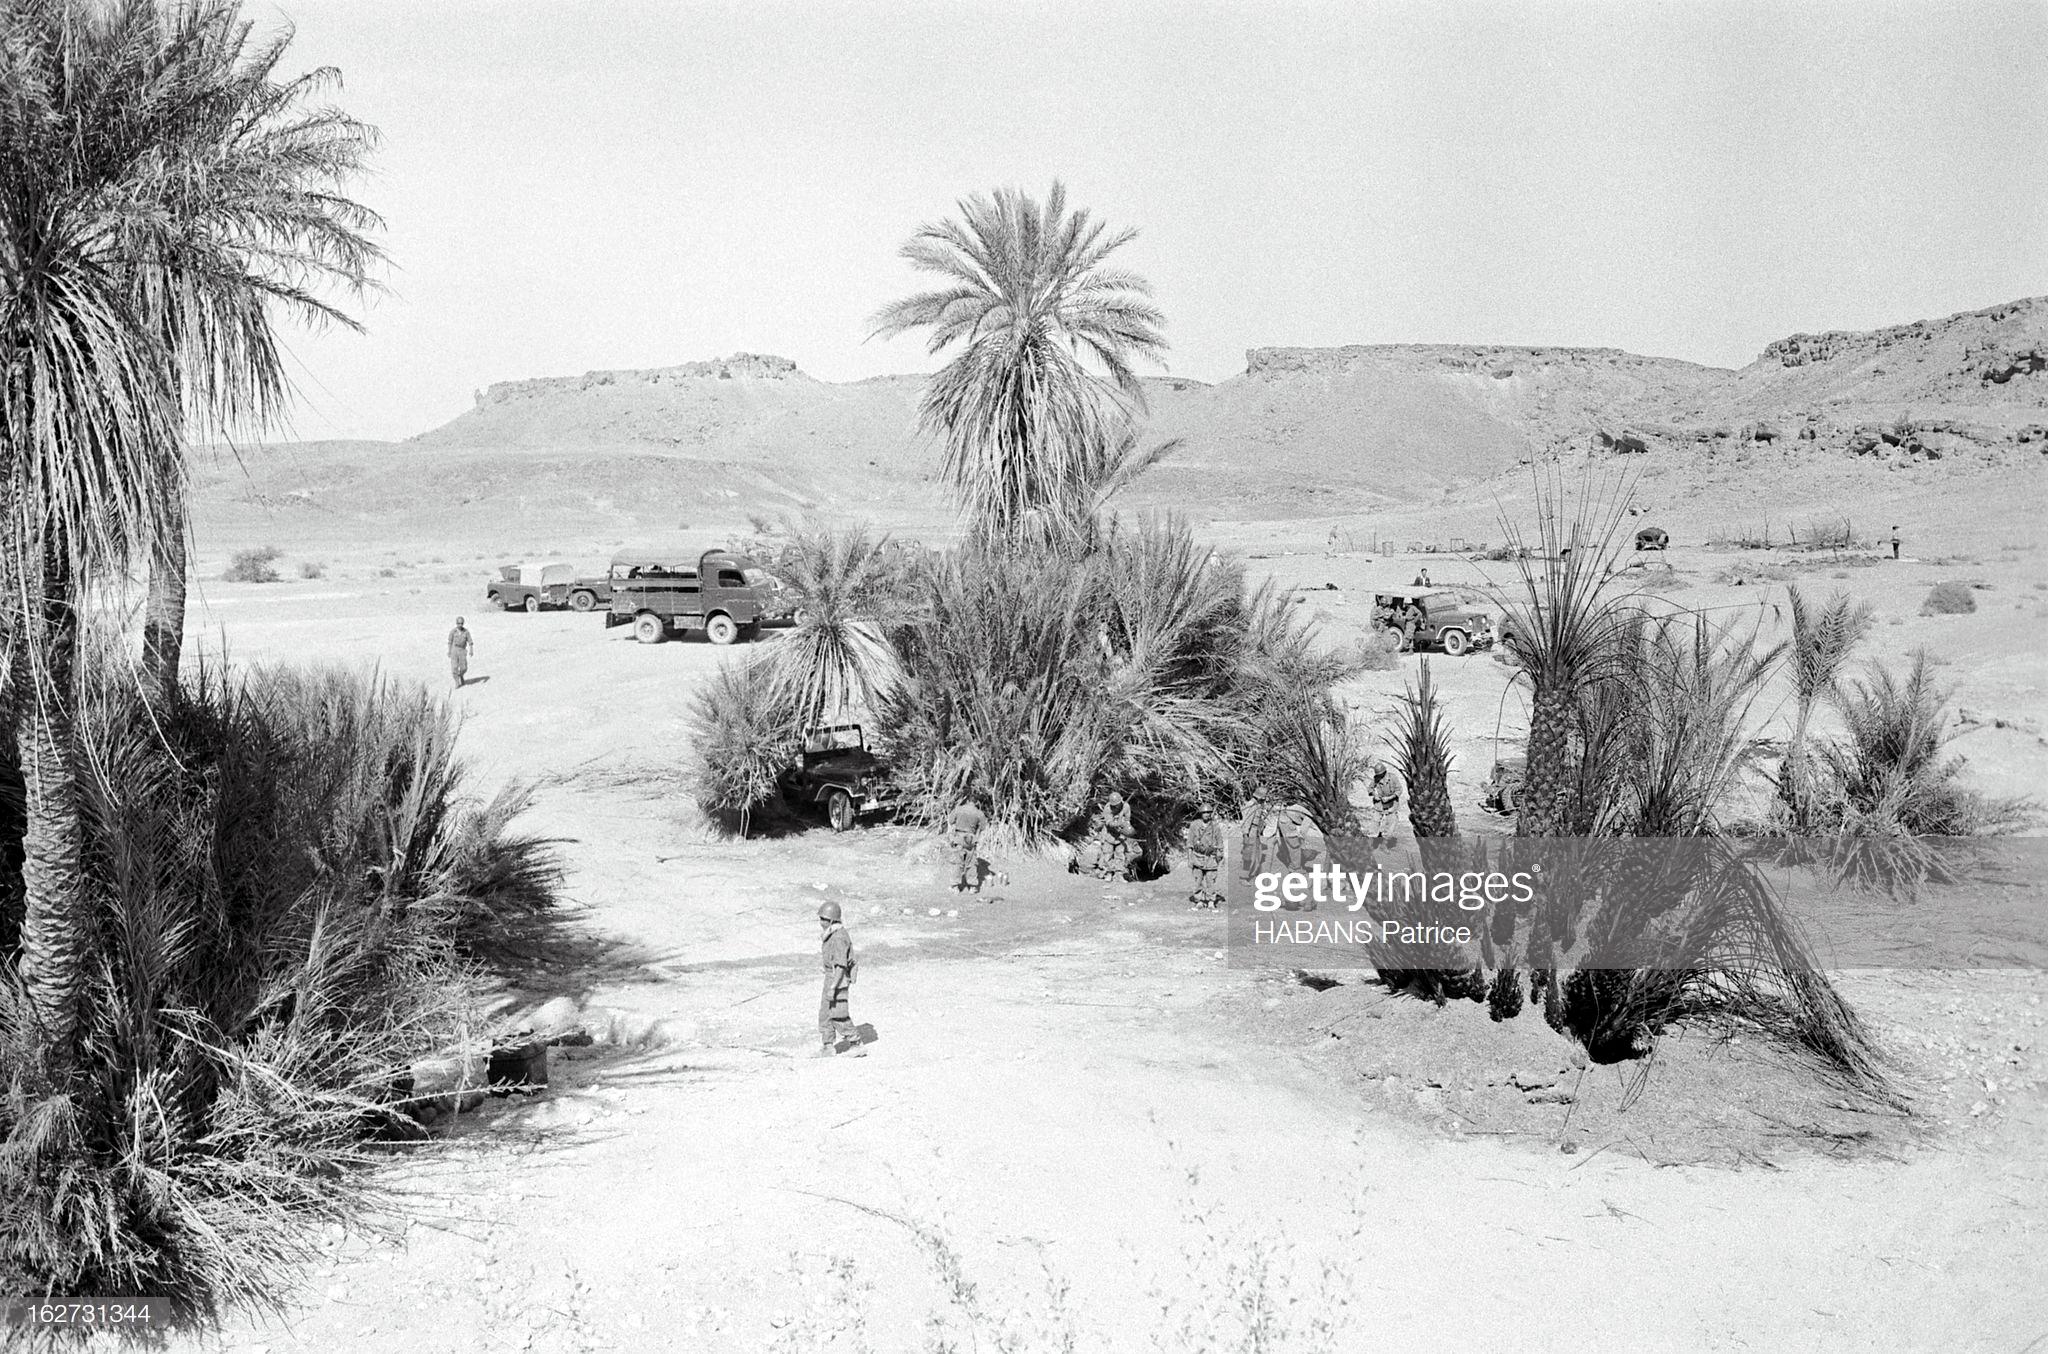 Photos - Guerre des Sables - 1963 - Page 8 47881159371_55b8f112a7_o